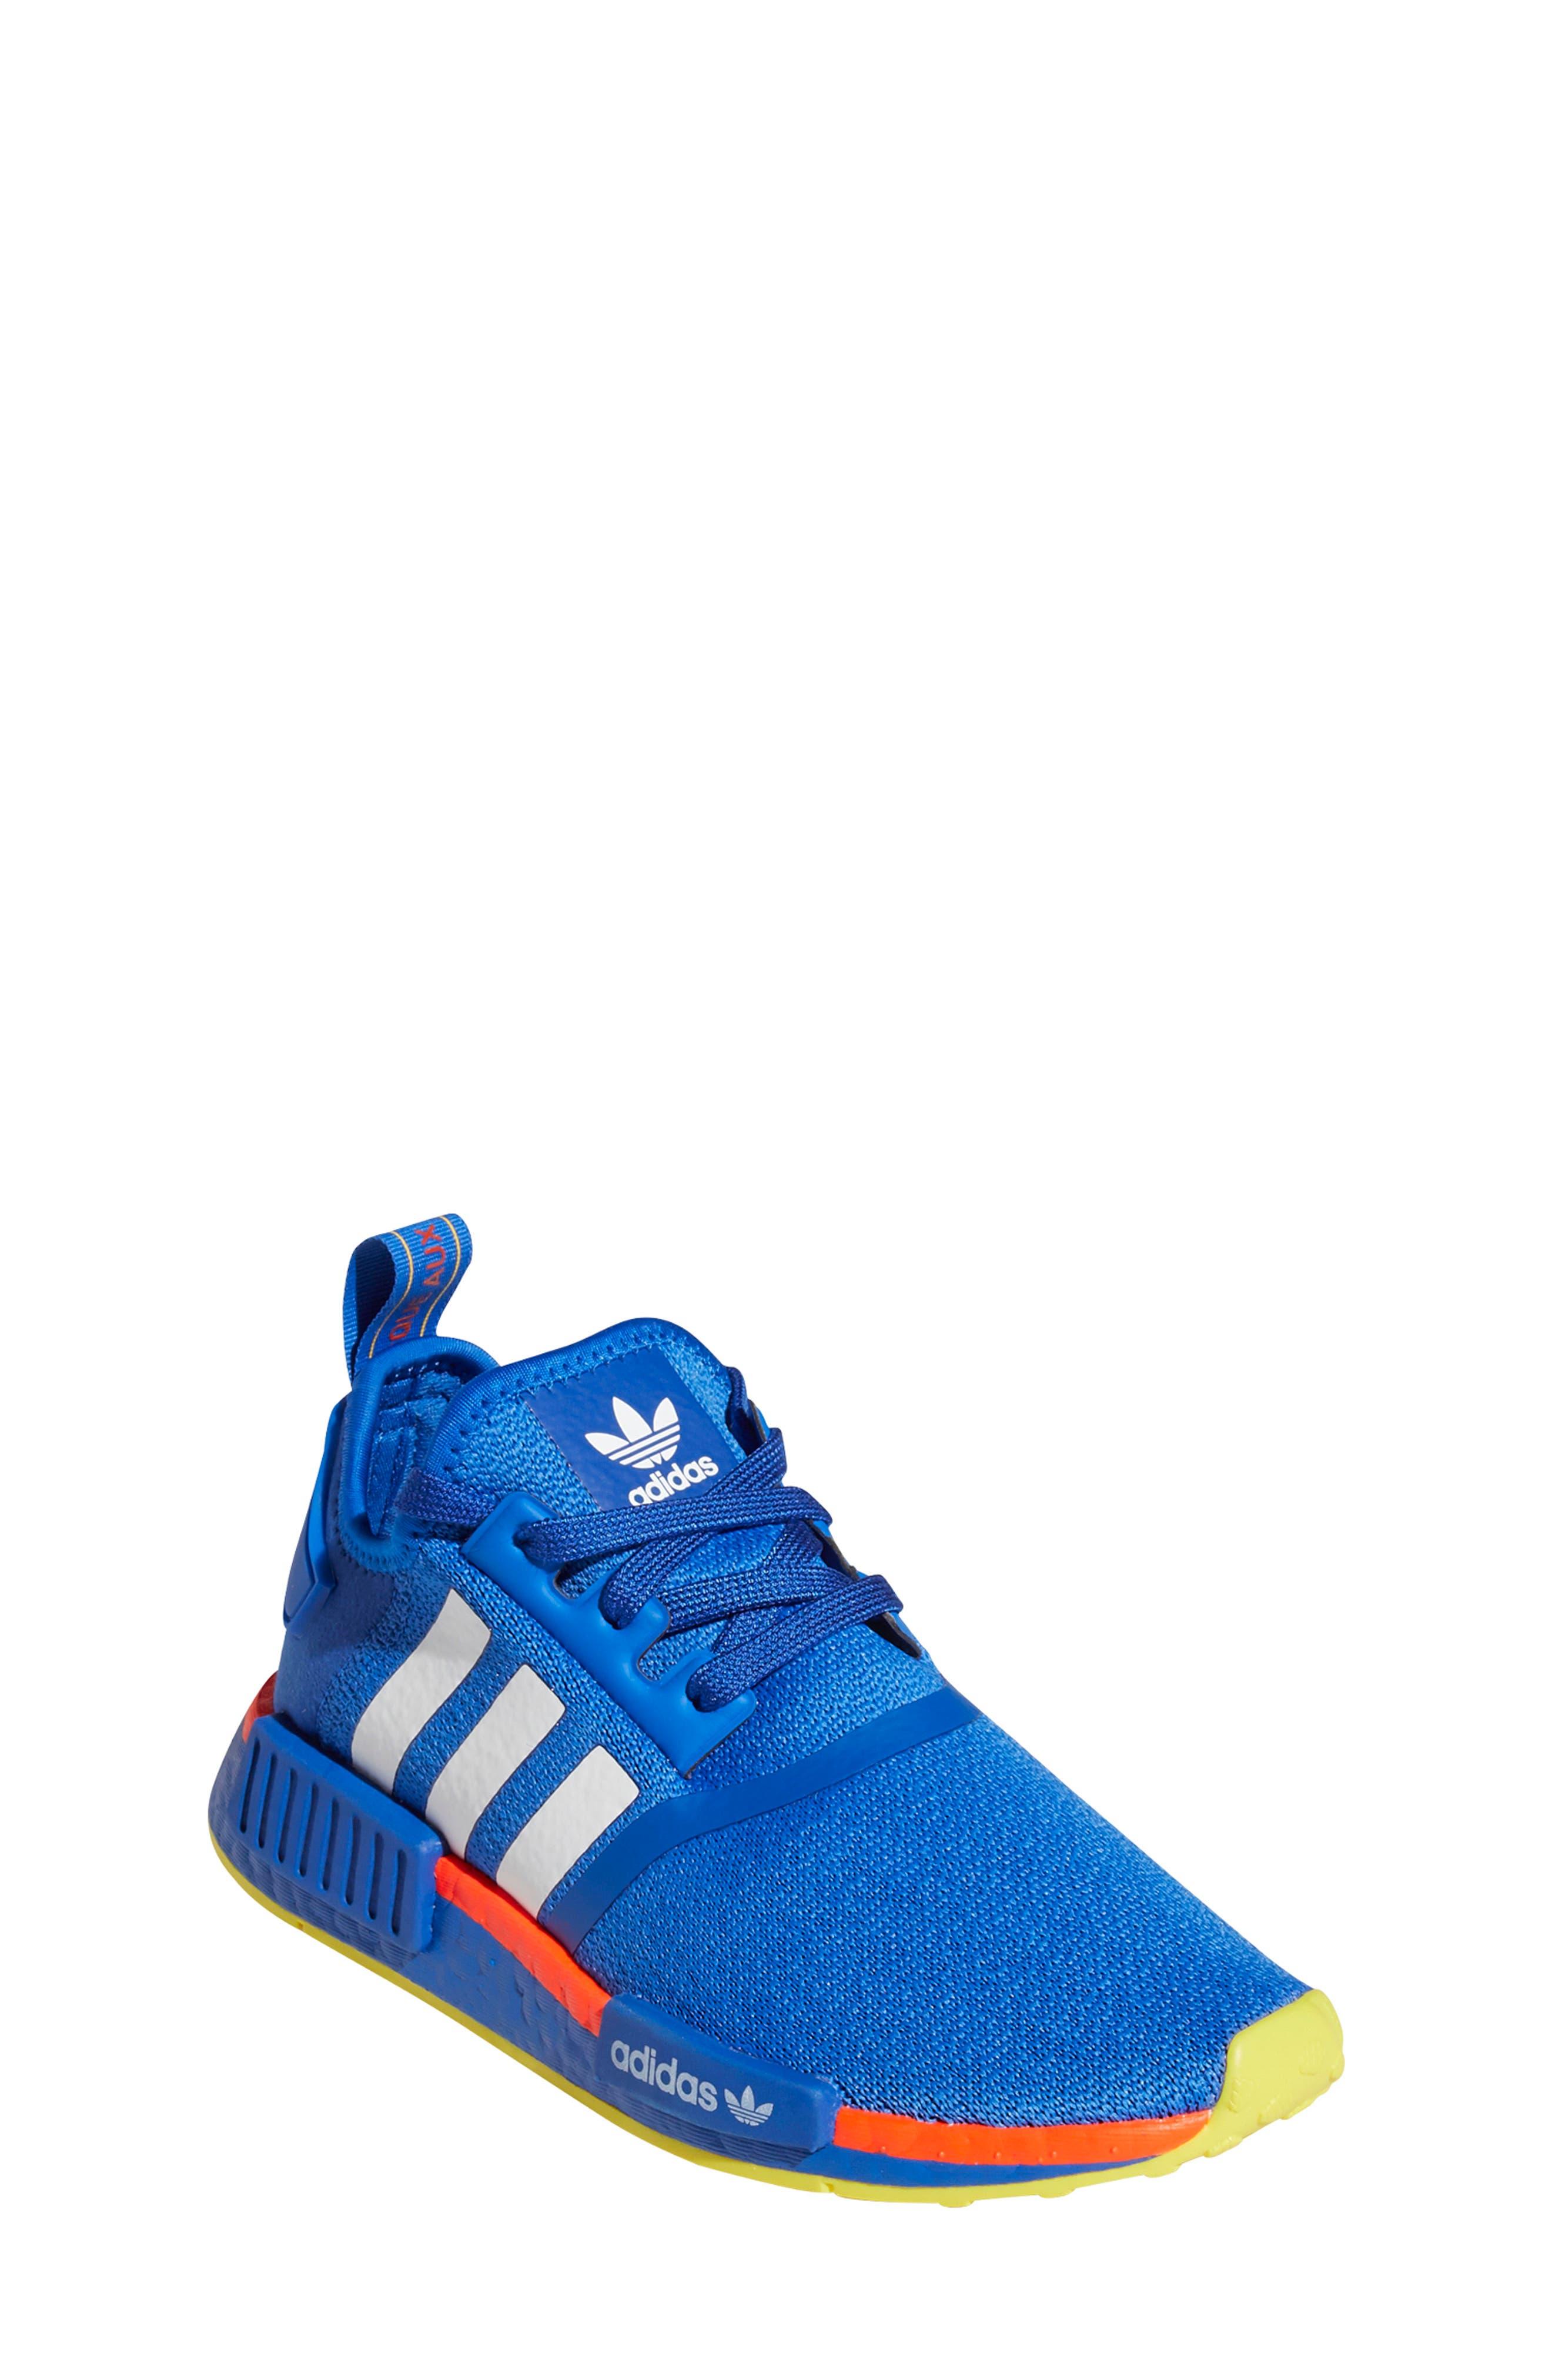 Image of adidas NMD_R1 J Sneaker